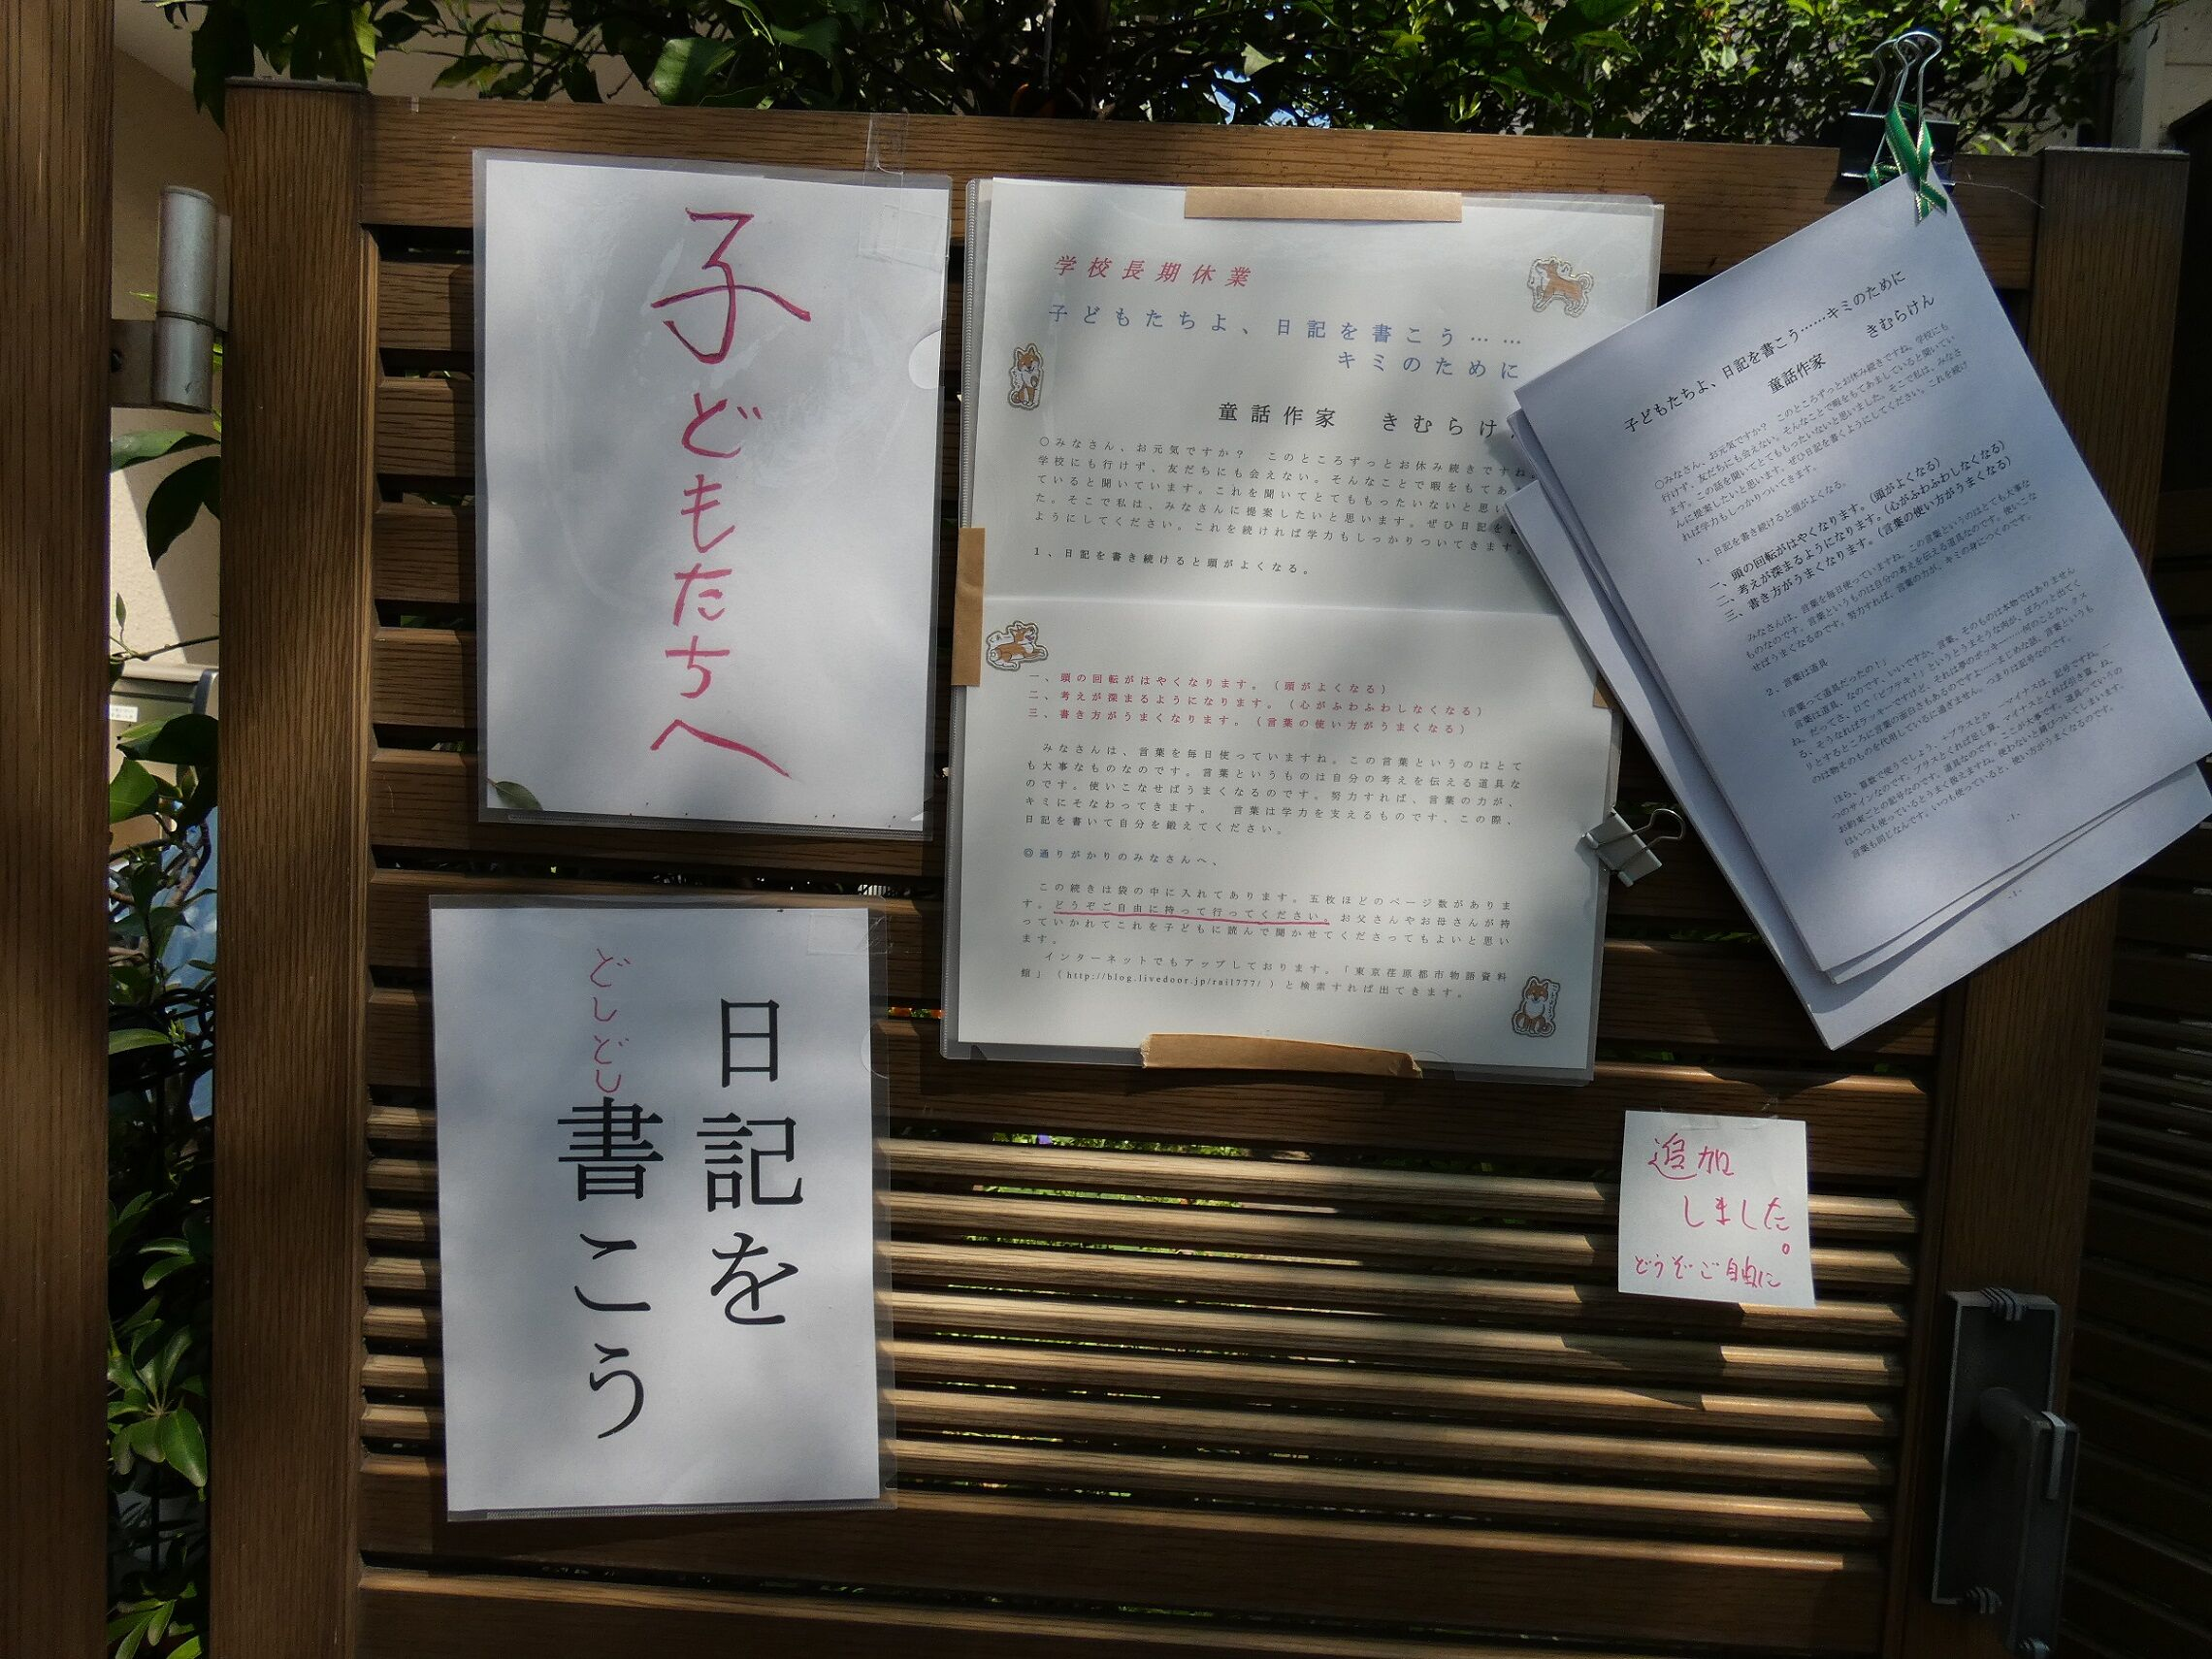 Web東京荏原都市物語資料館 - livedoor Blog(ブログ)